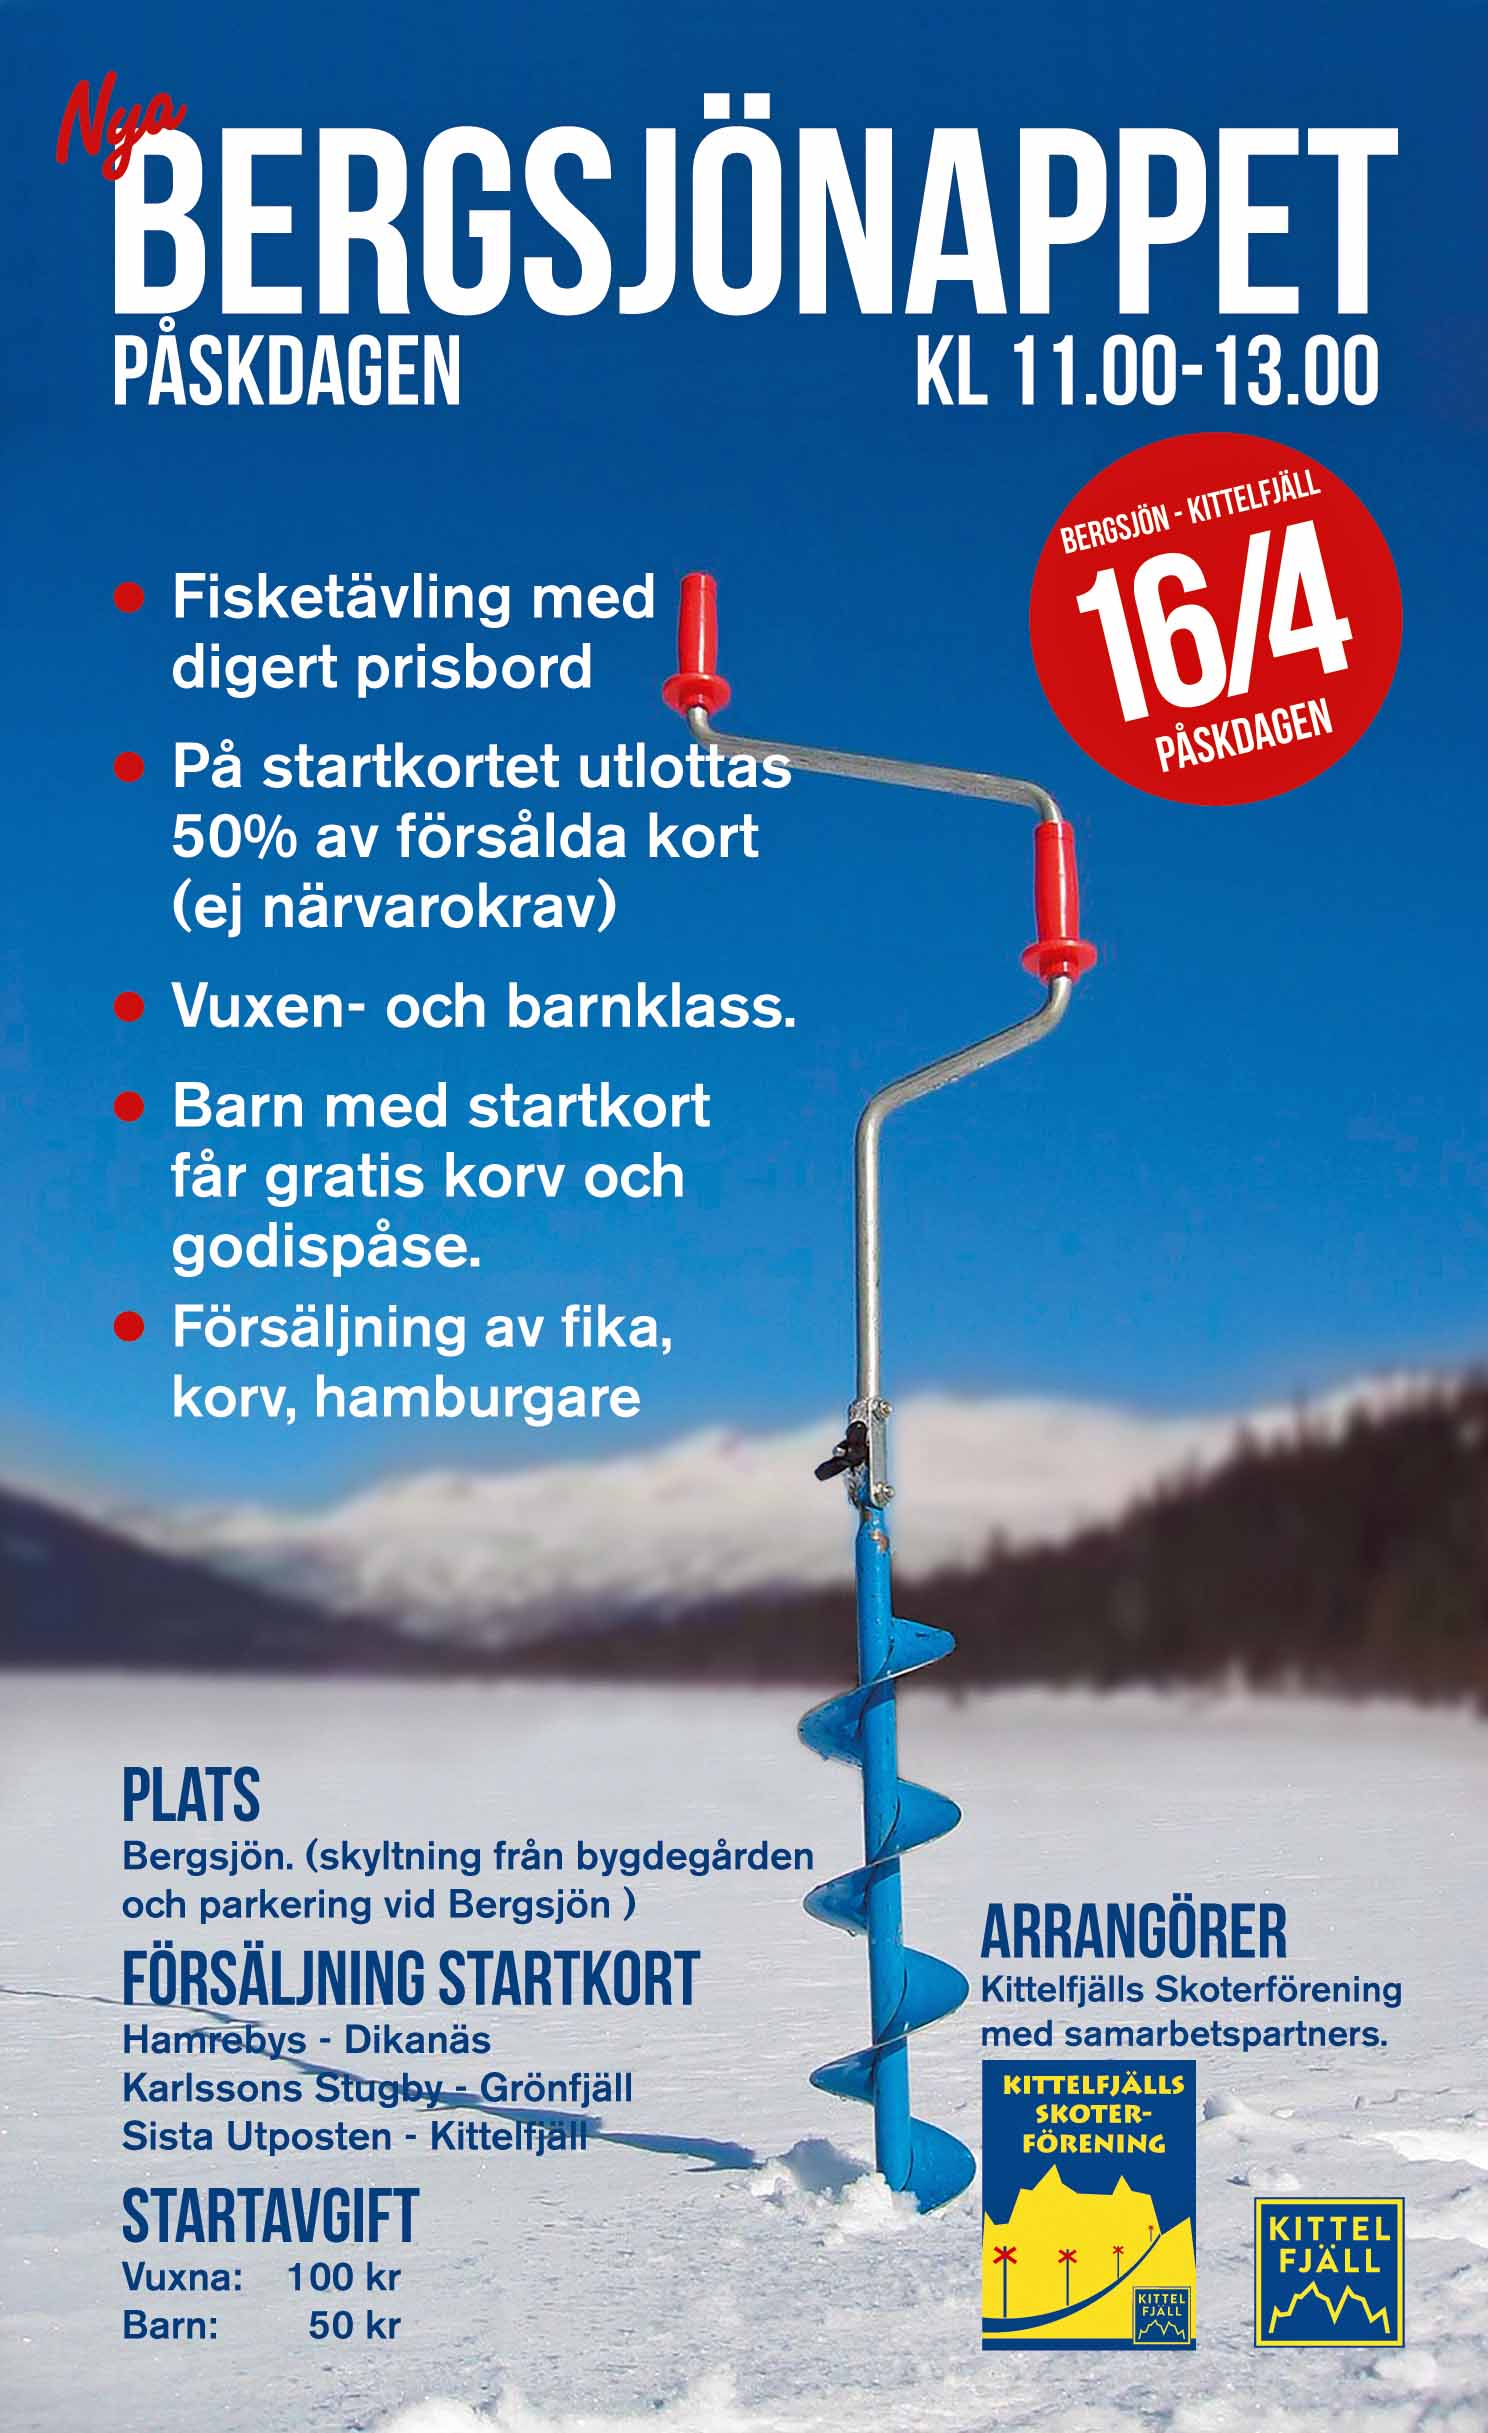 Bergsjönappet 2017